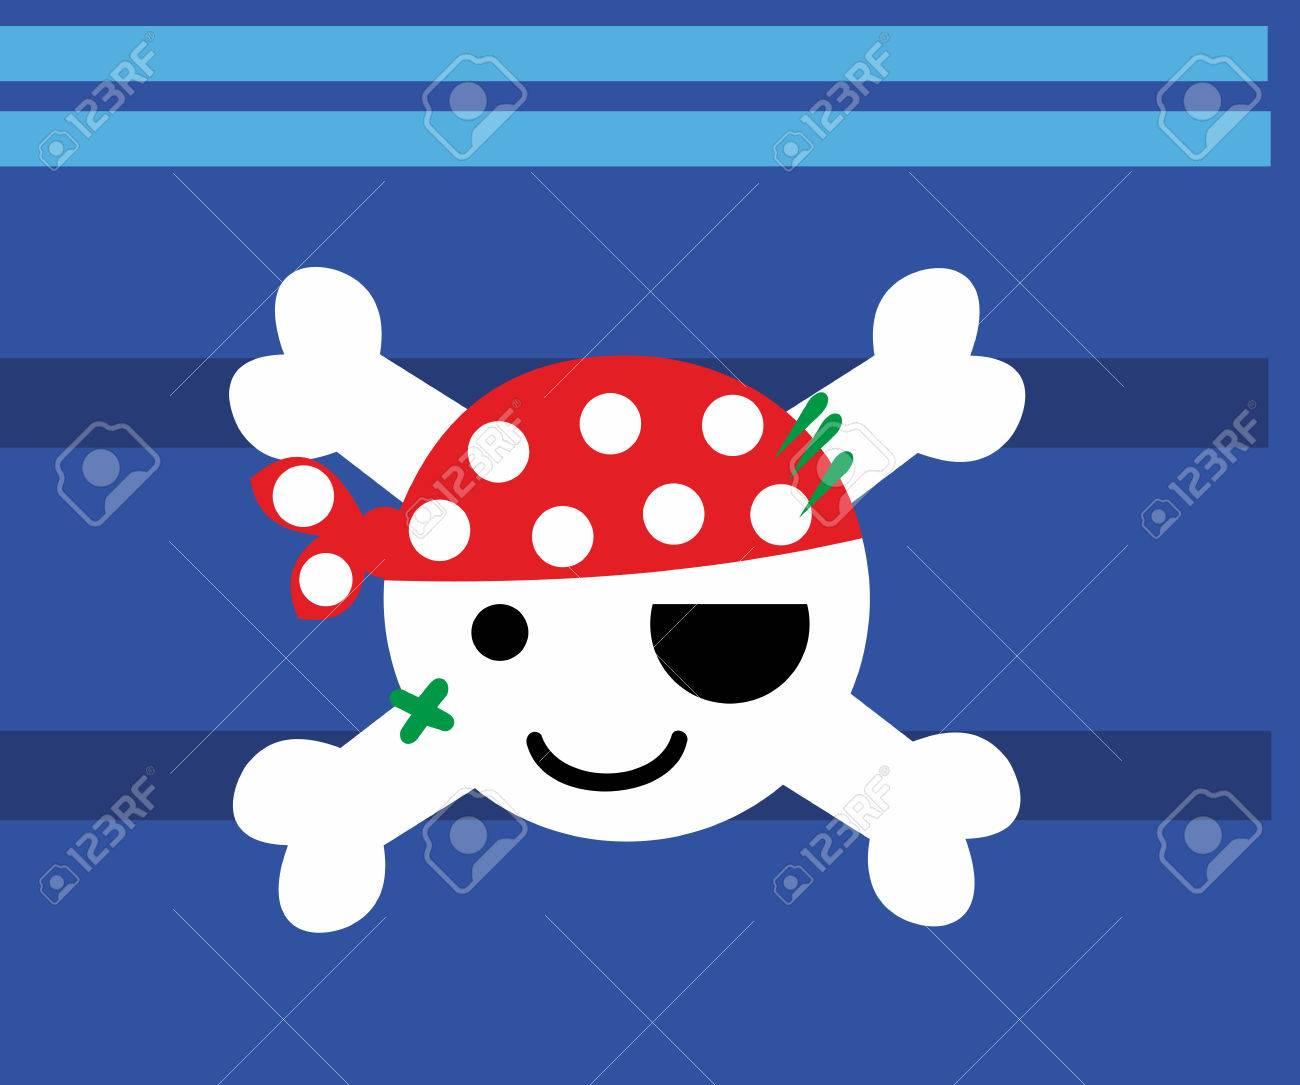 Pirate baby - 40591641